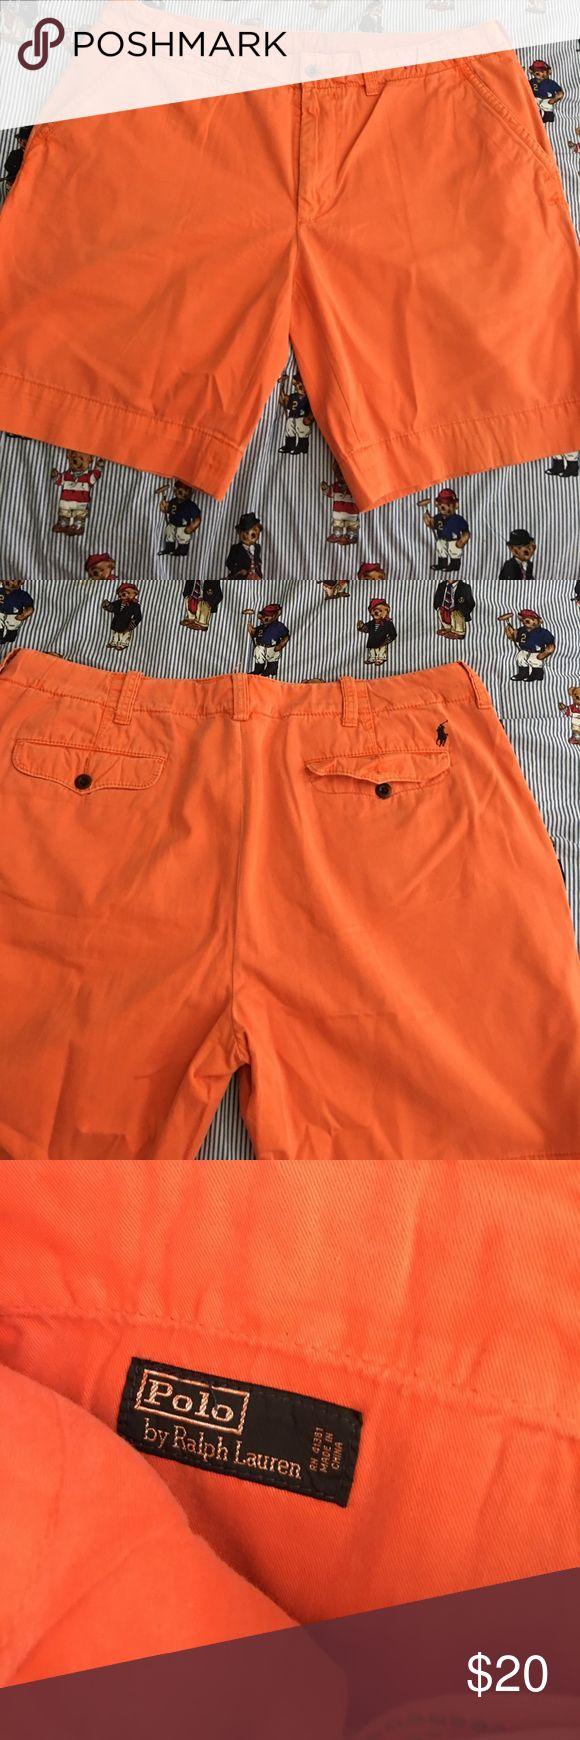 Polo Ralph Lauren shorts Polo Ralph Lauren shorts in good condition Polo by Ralph Lauren Shorts Cargo